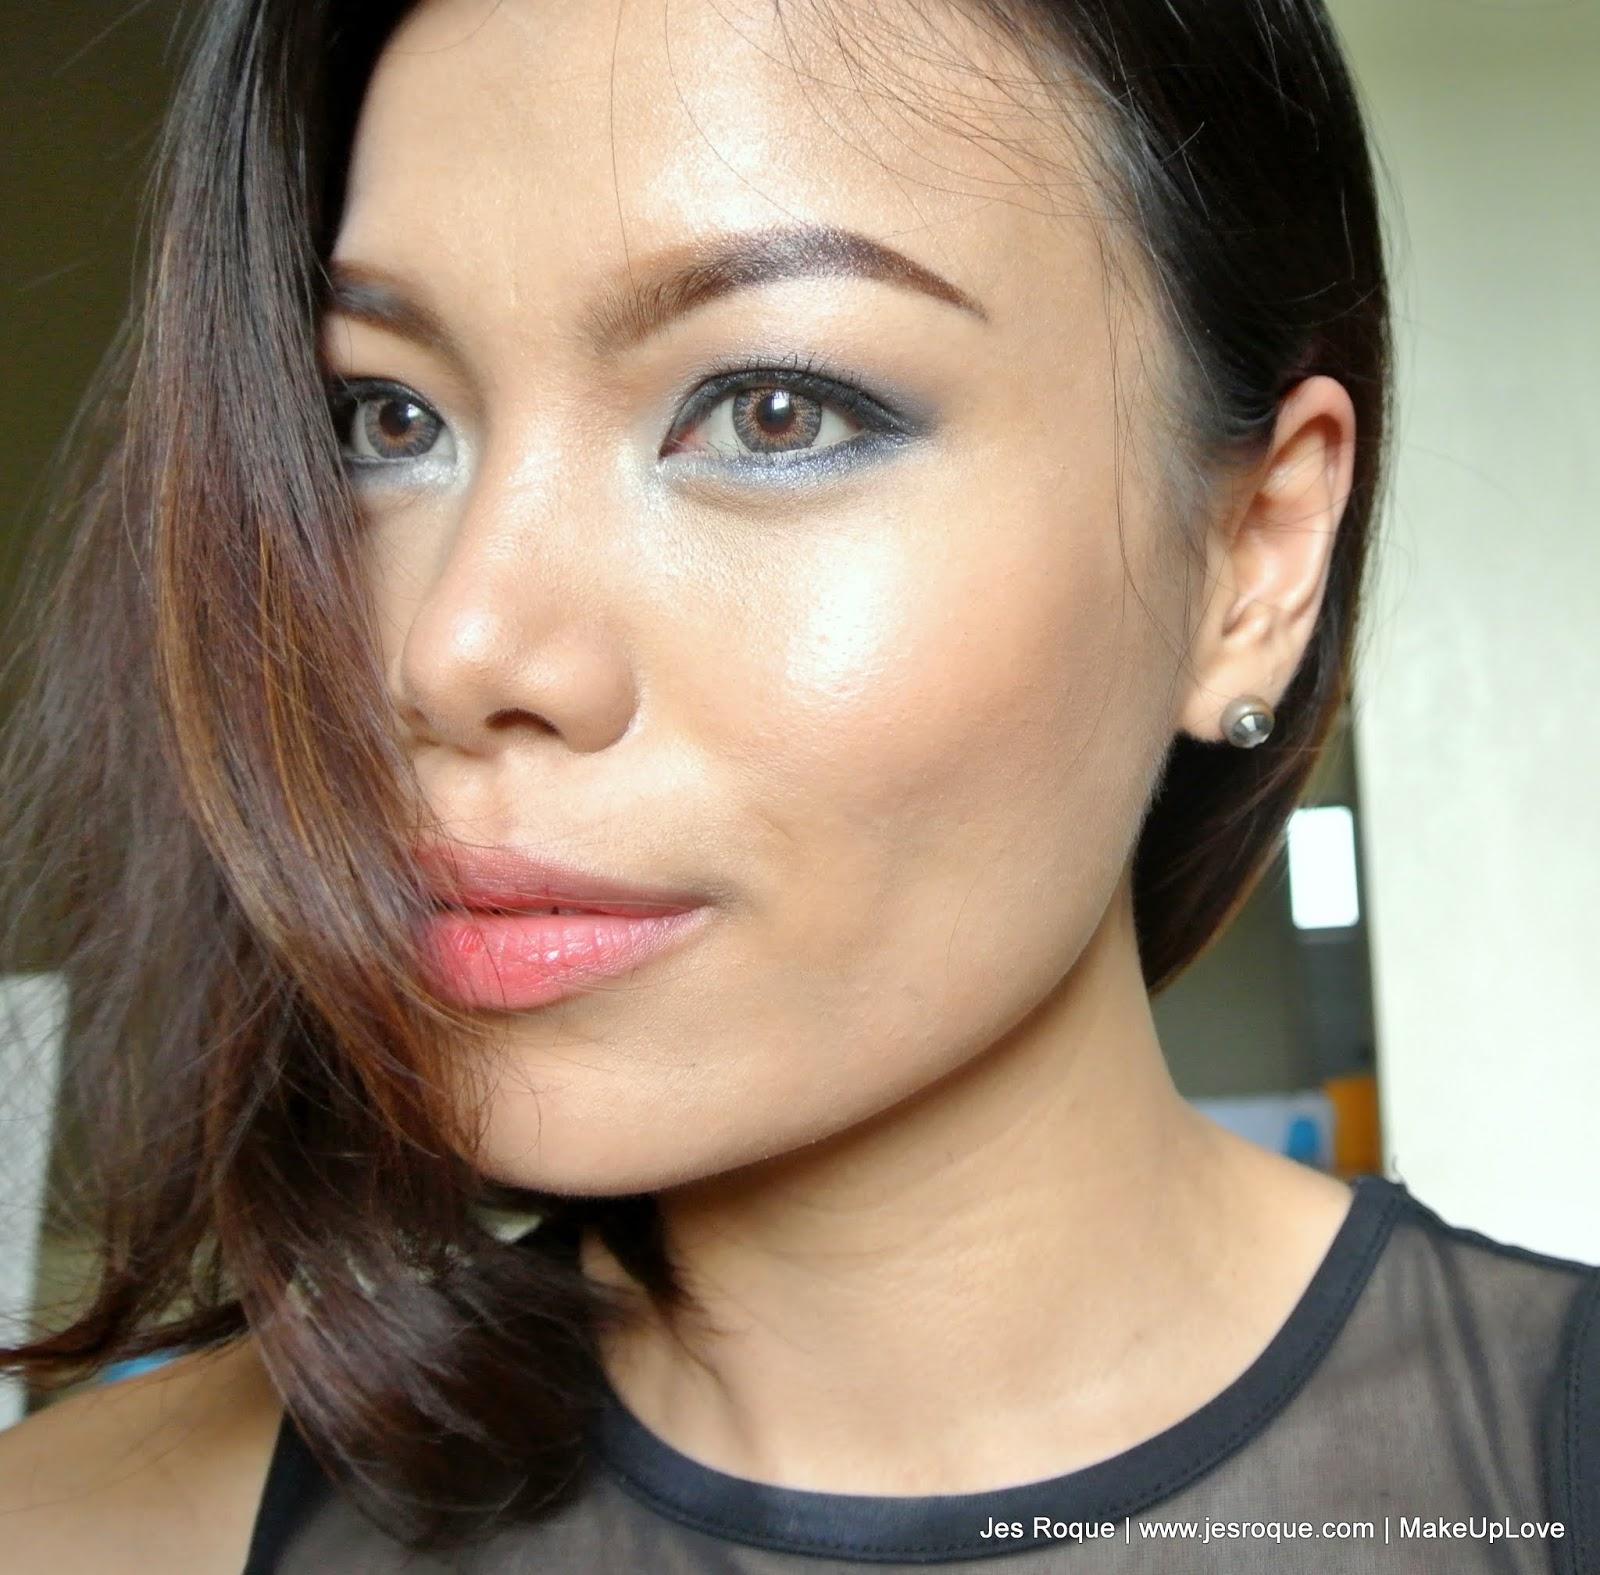 ... Lifestyle: ... L'oreal Foundation Makeup True Match